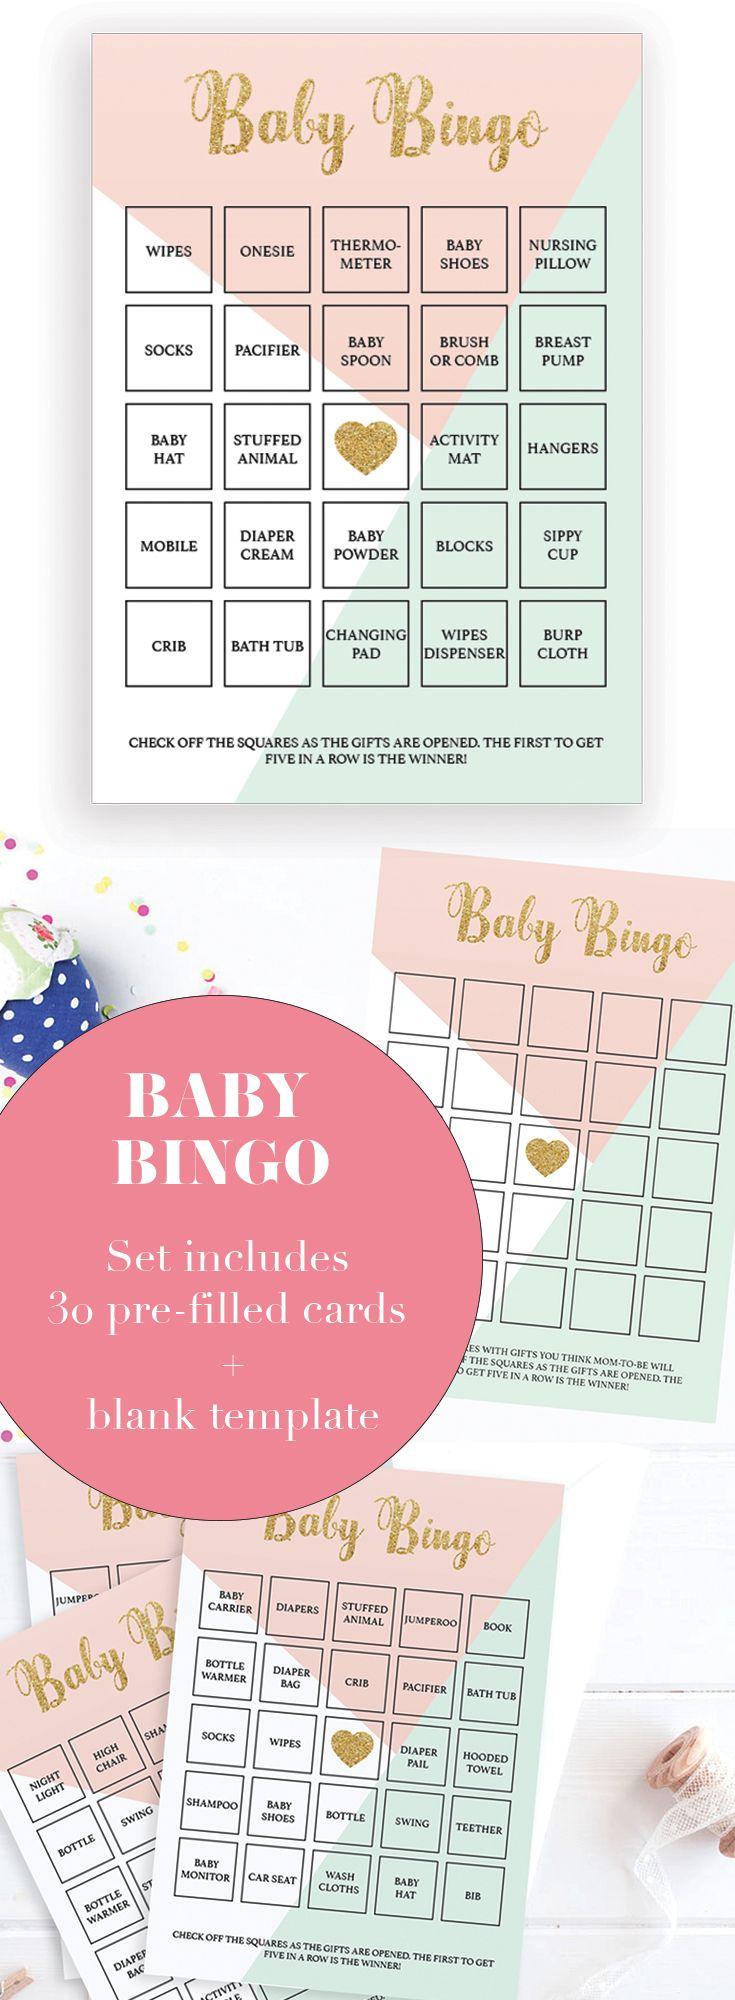 Printable Baby Bingo Game Cards - Pastel | Babyparty